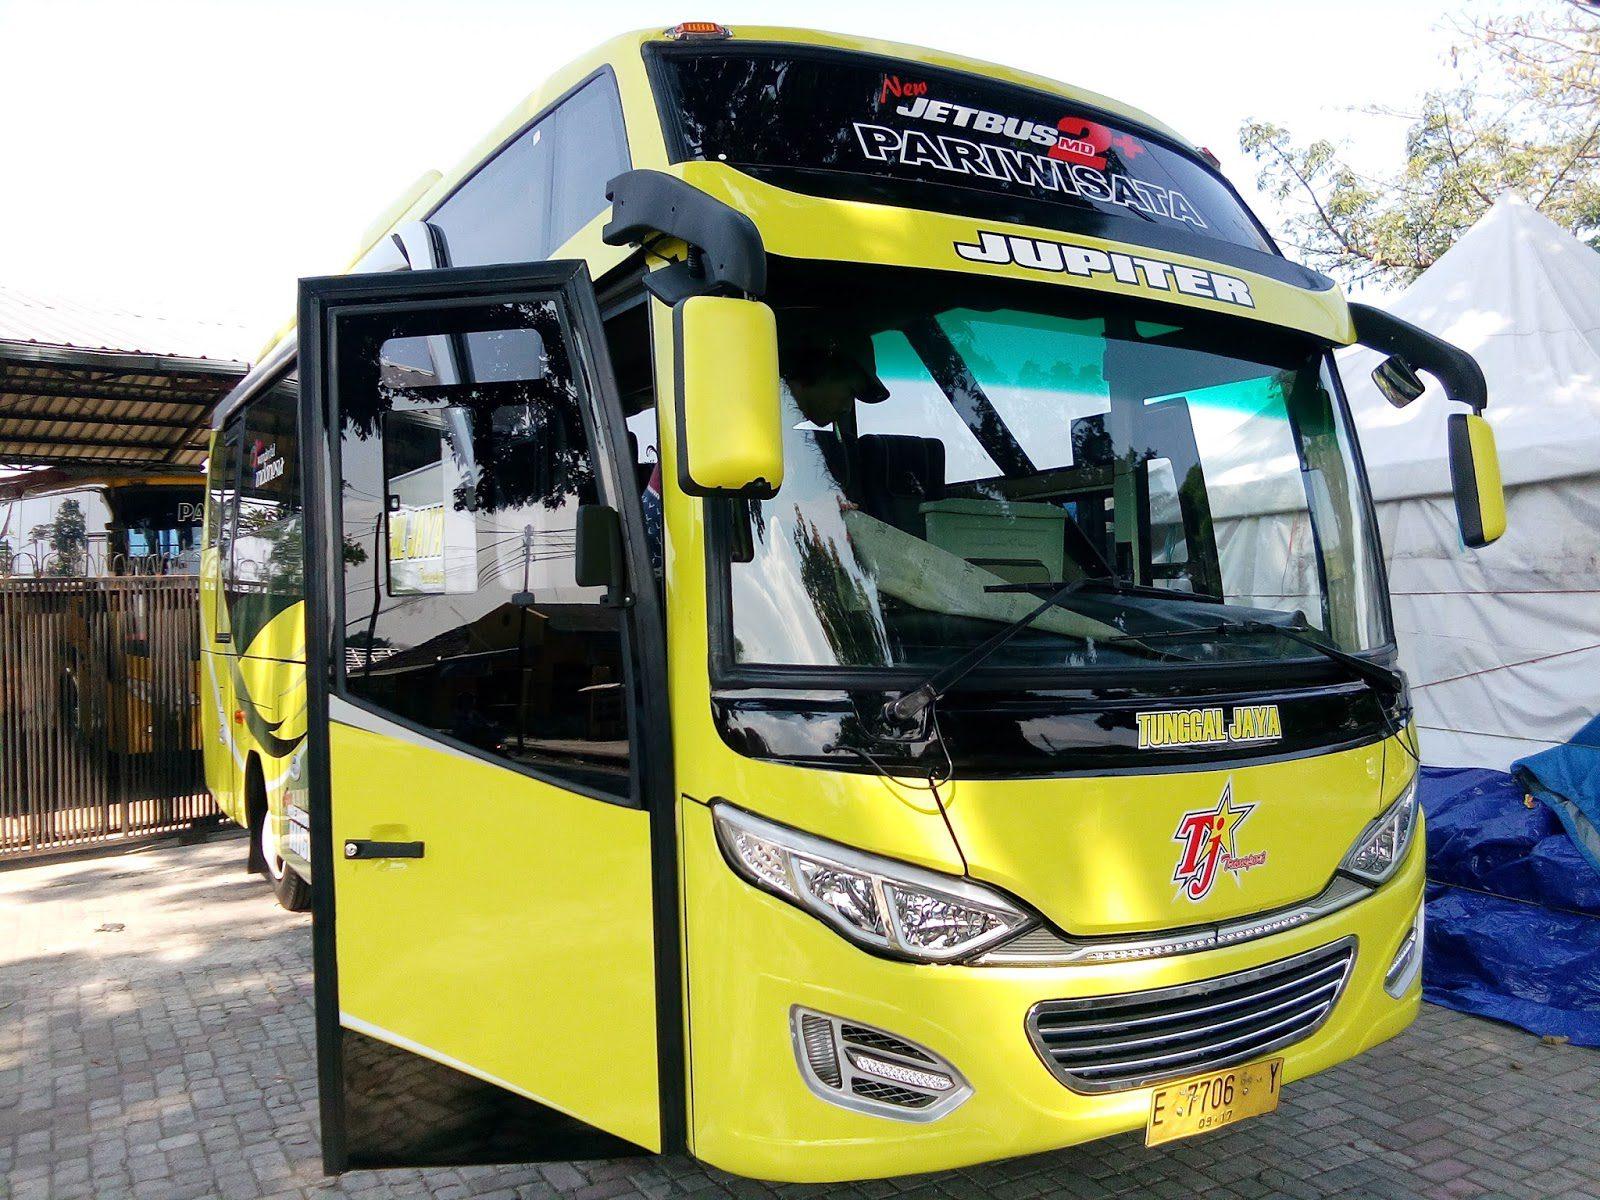 Sewa Bus Pariwisata Malang Murah Terbaru Harga 7 Agen Travel